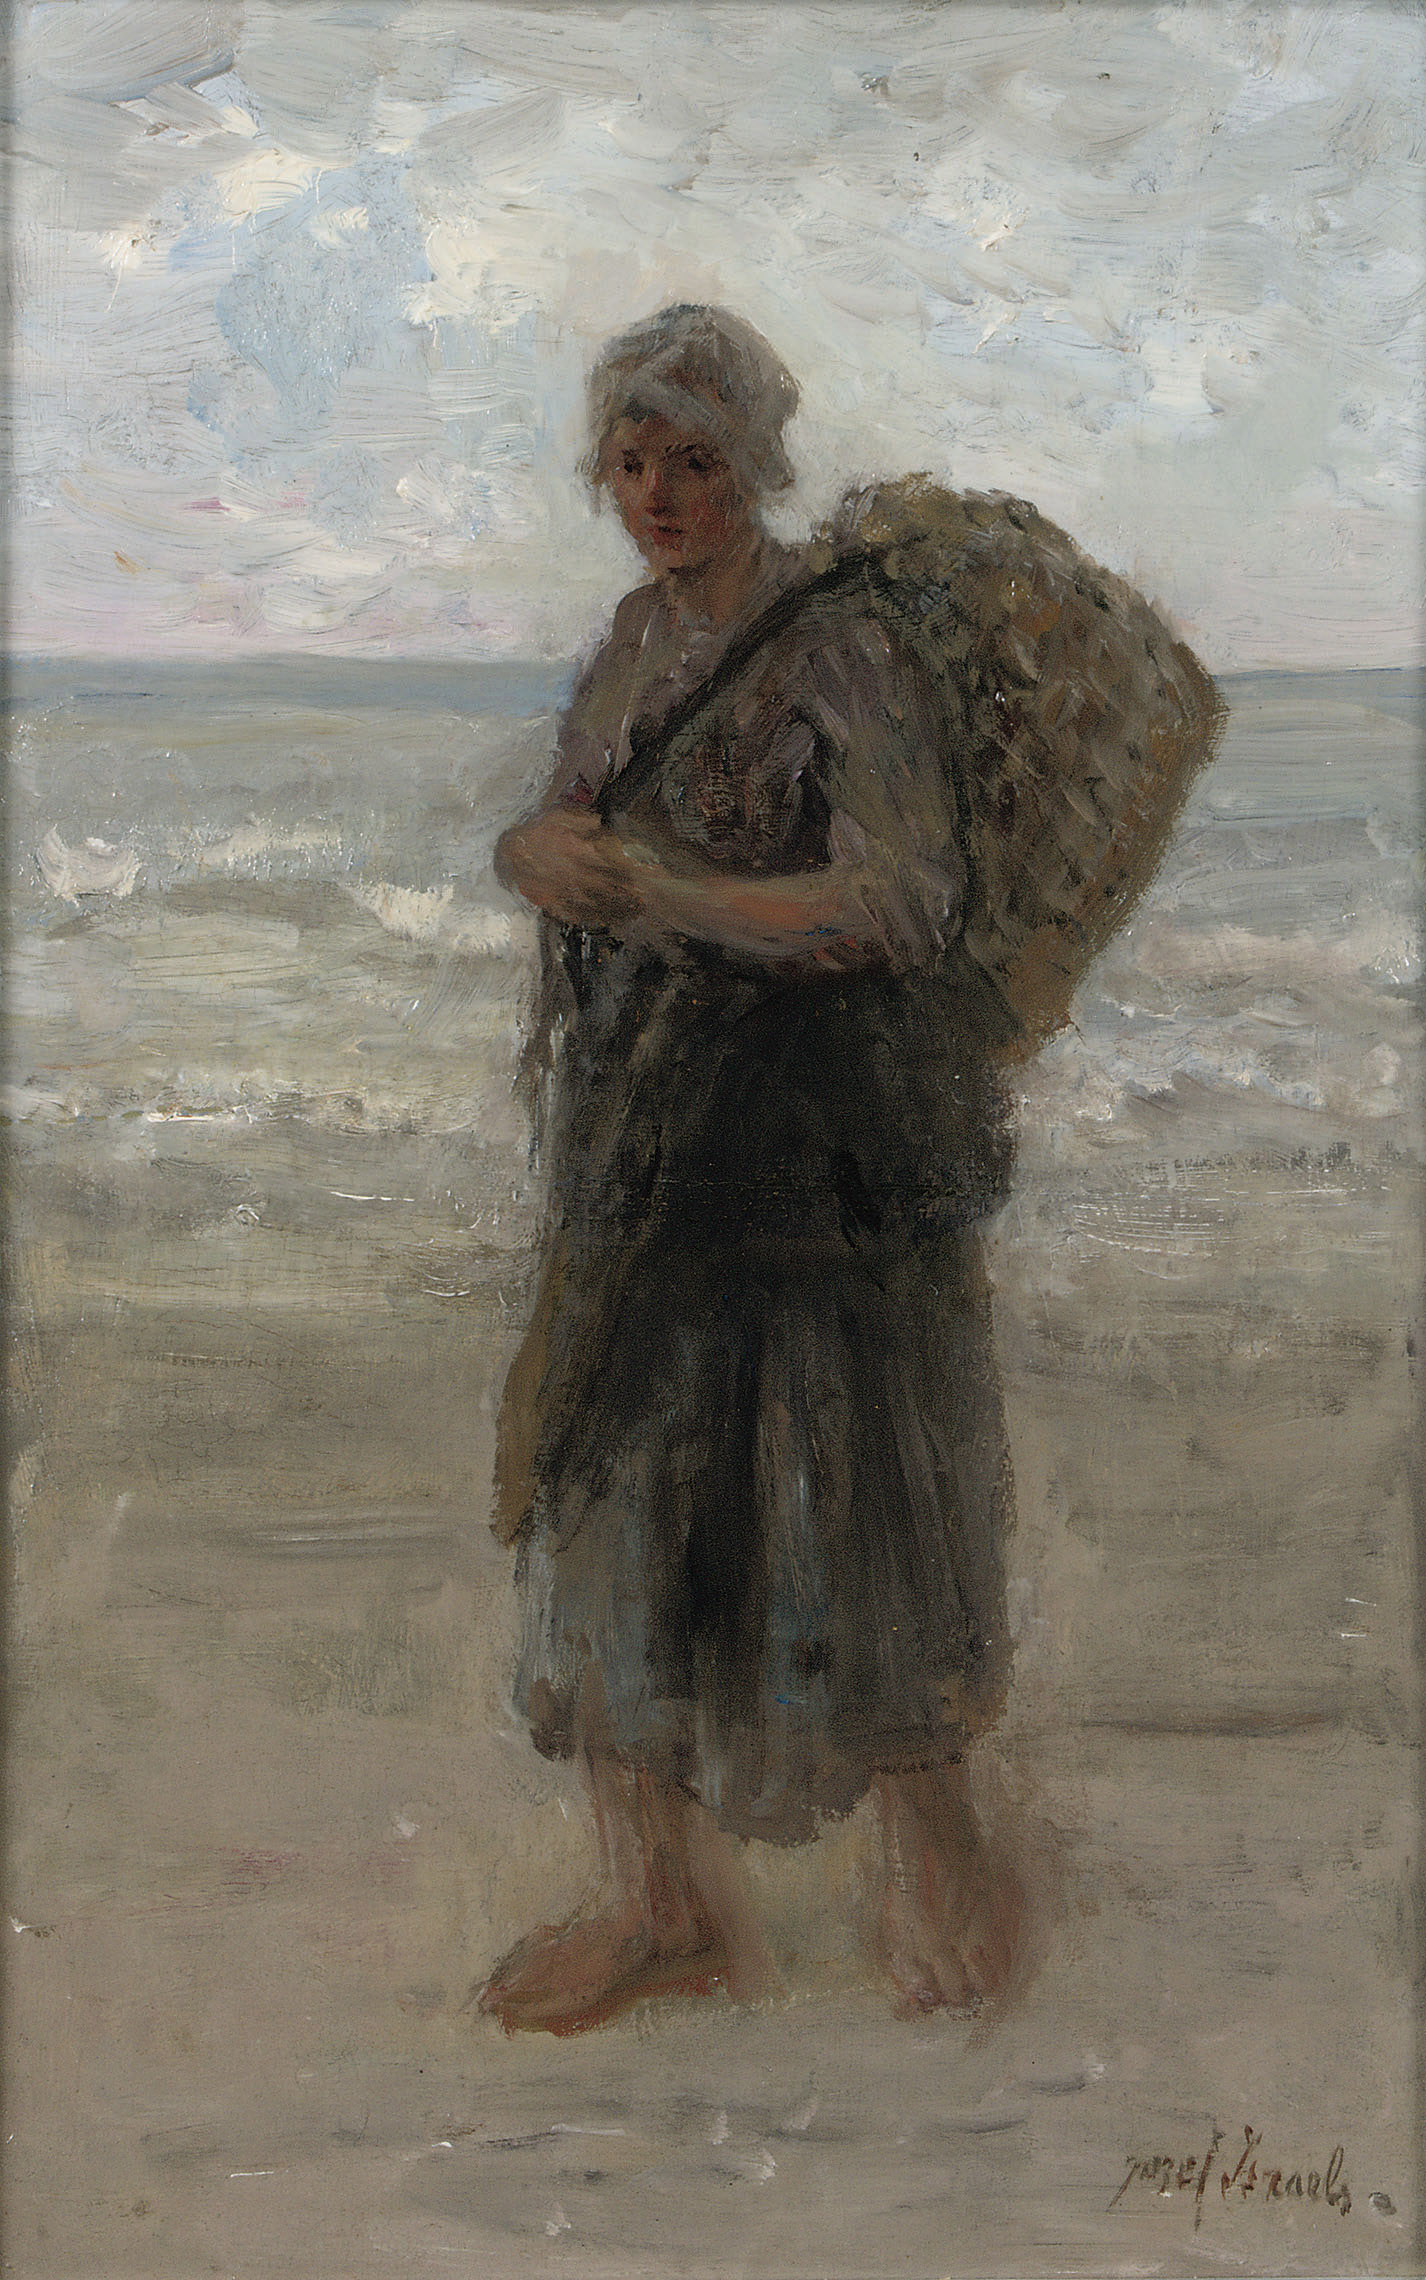 A fisherwoman on the beach